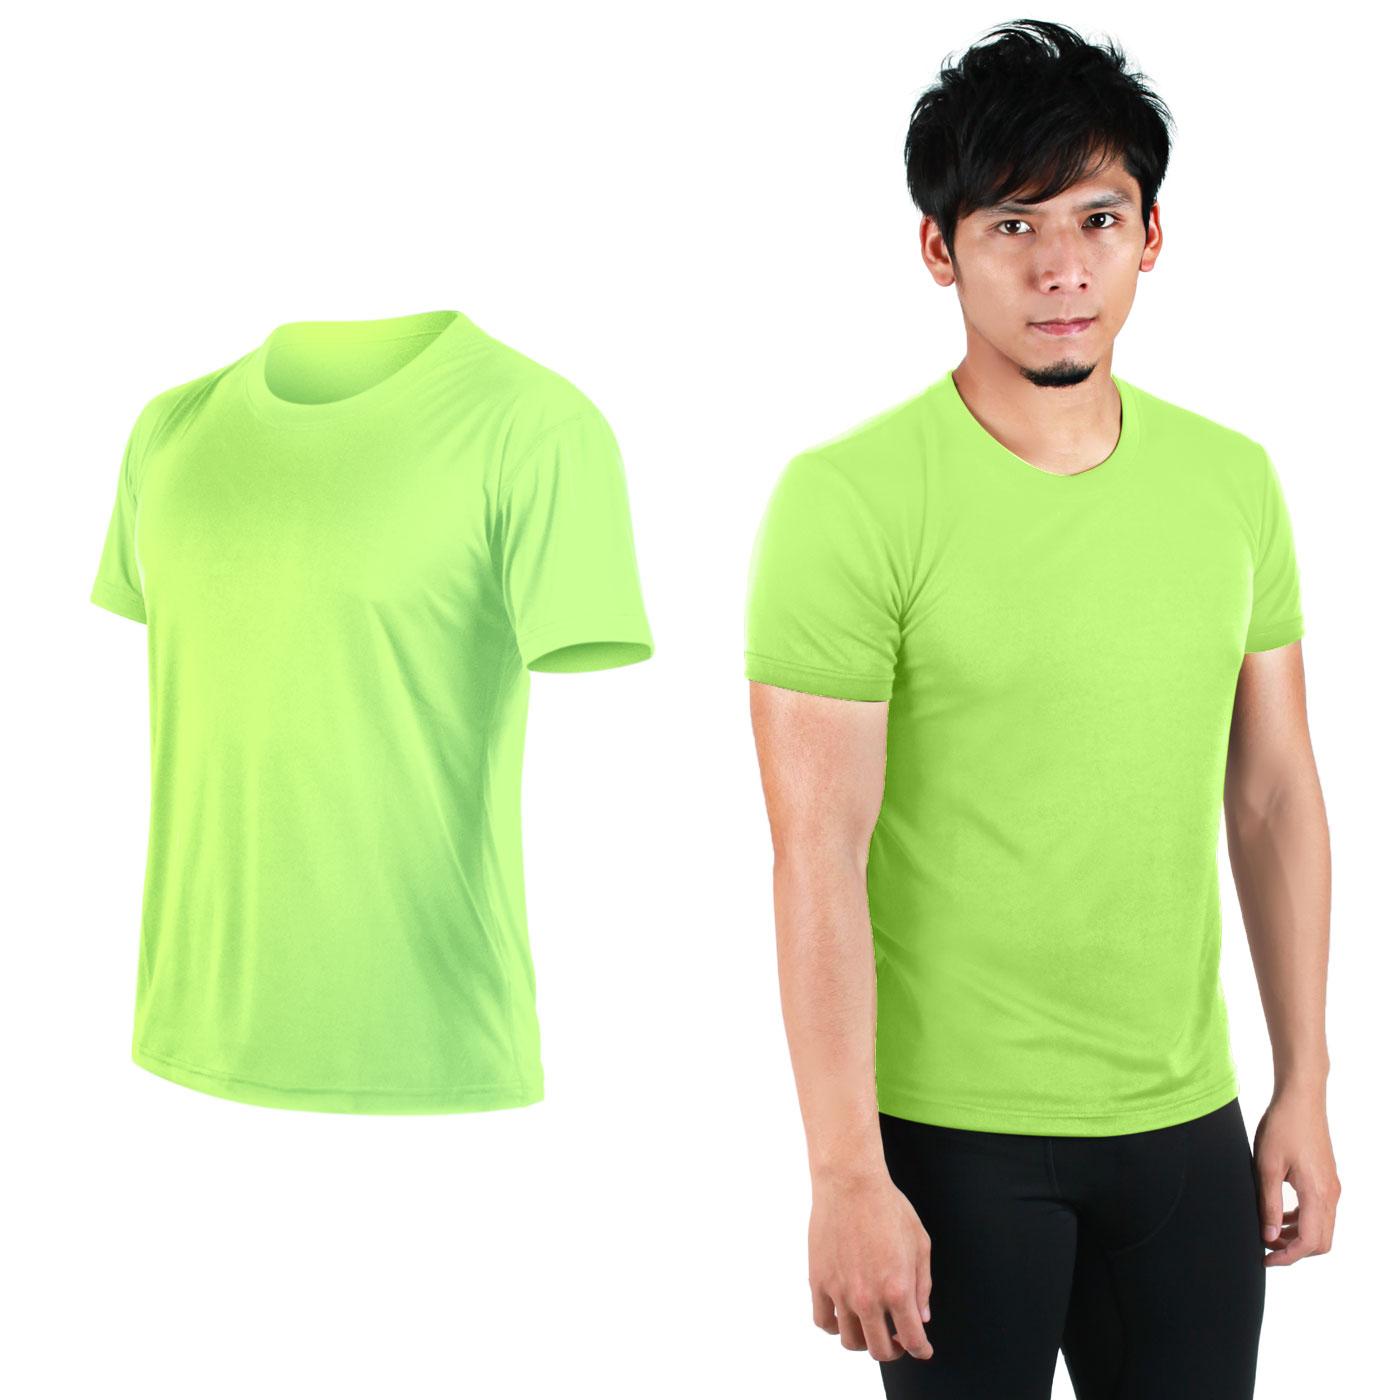 HODARLA FLARE 100 吸濕排汗衫3108301 - 螢光綠